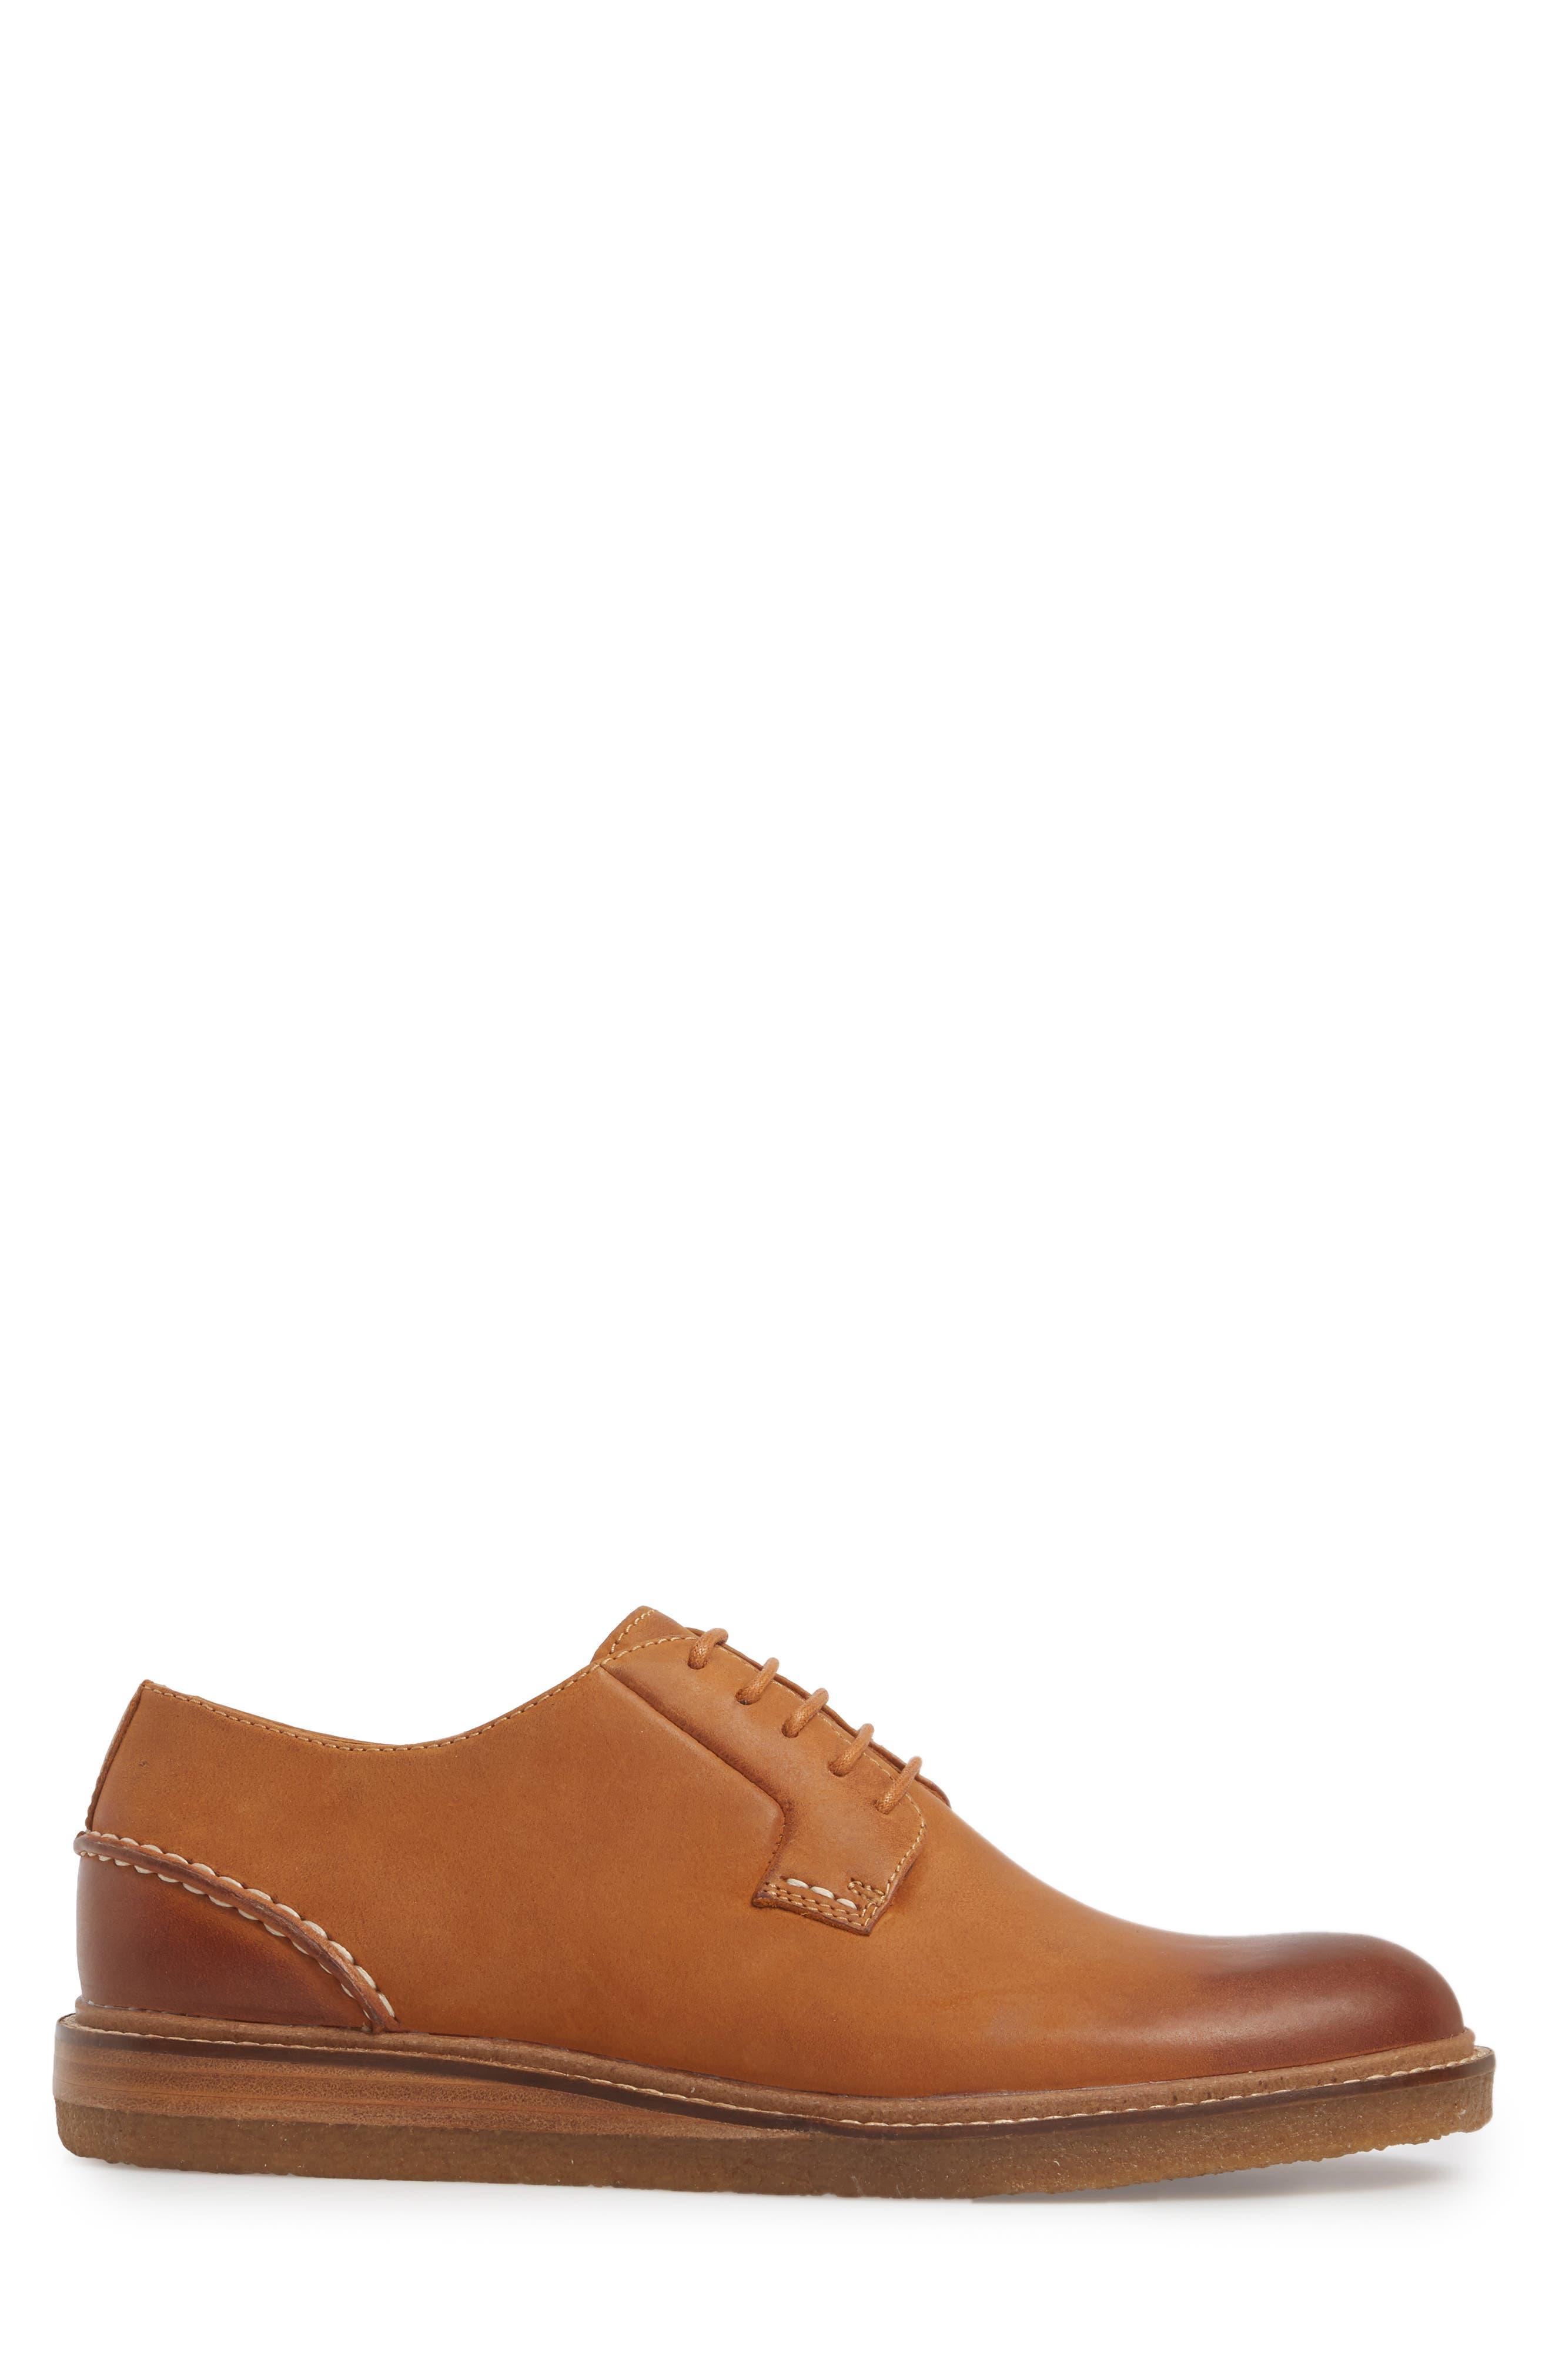 Gold Cup Plain Toe Derby,                             Alternate thumbnail 3, color,                             Tan Leather